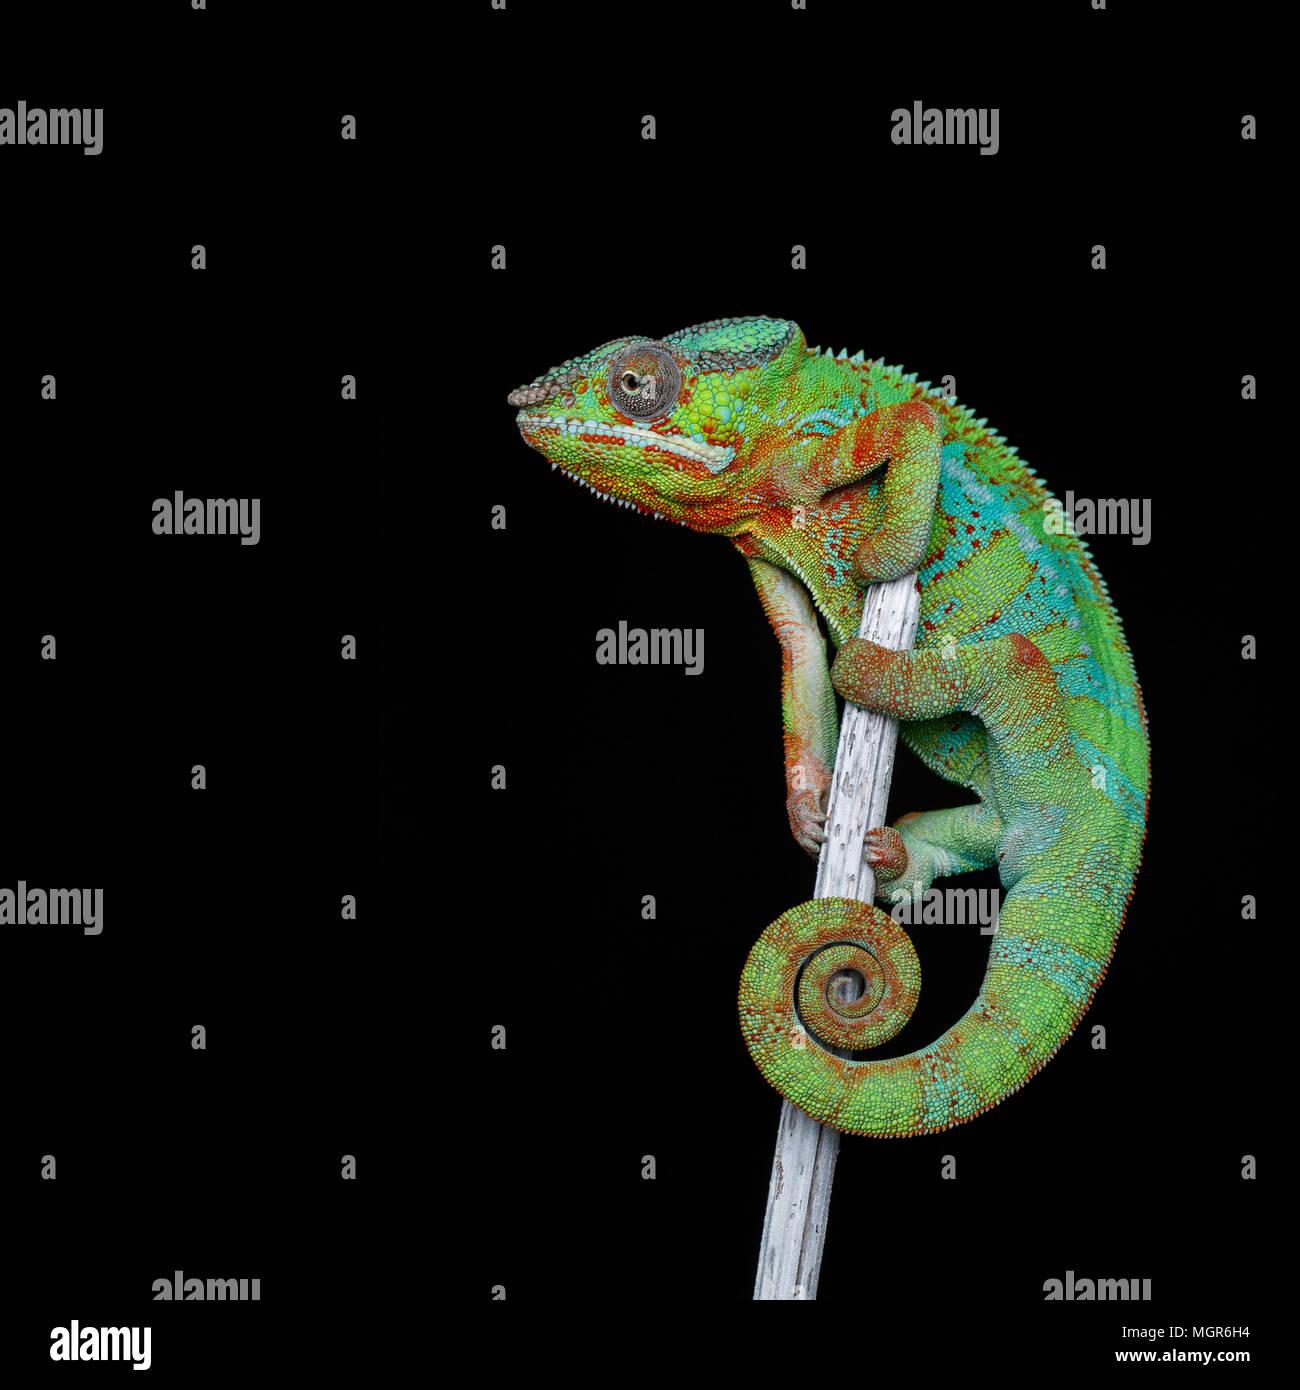 alive chameleon reptile - Stock Image